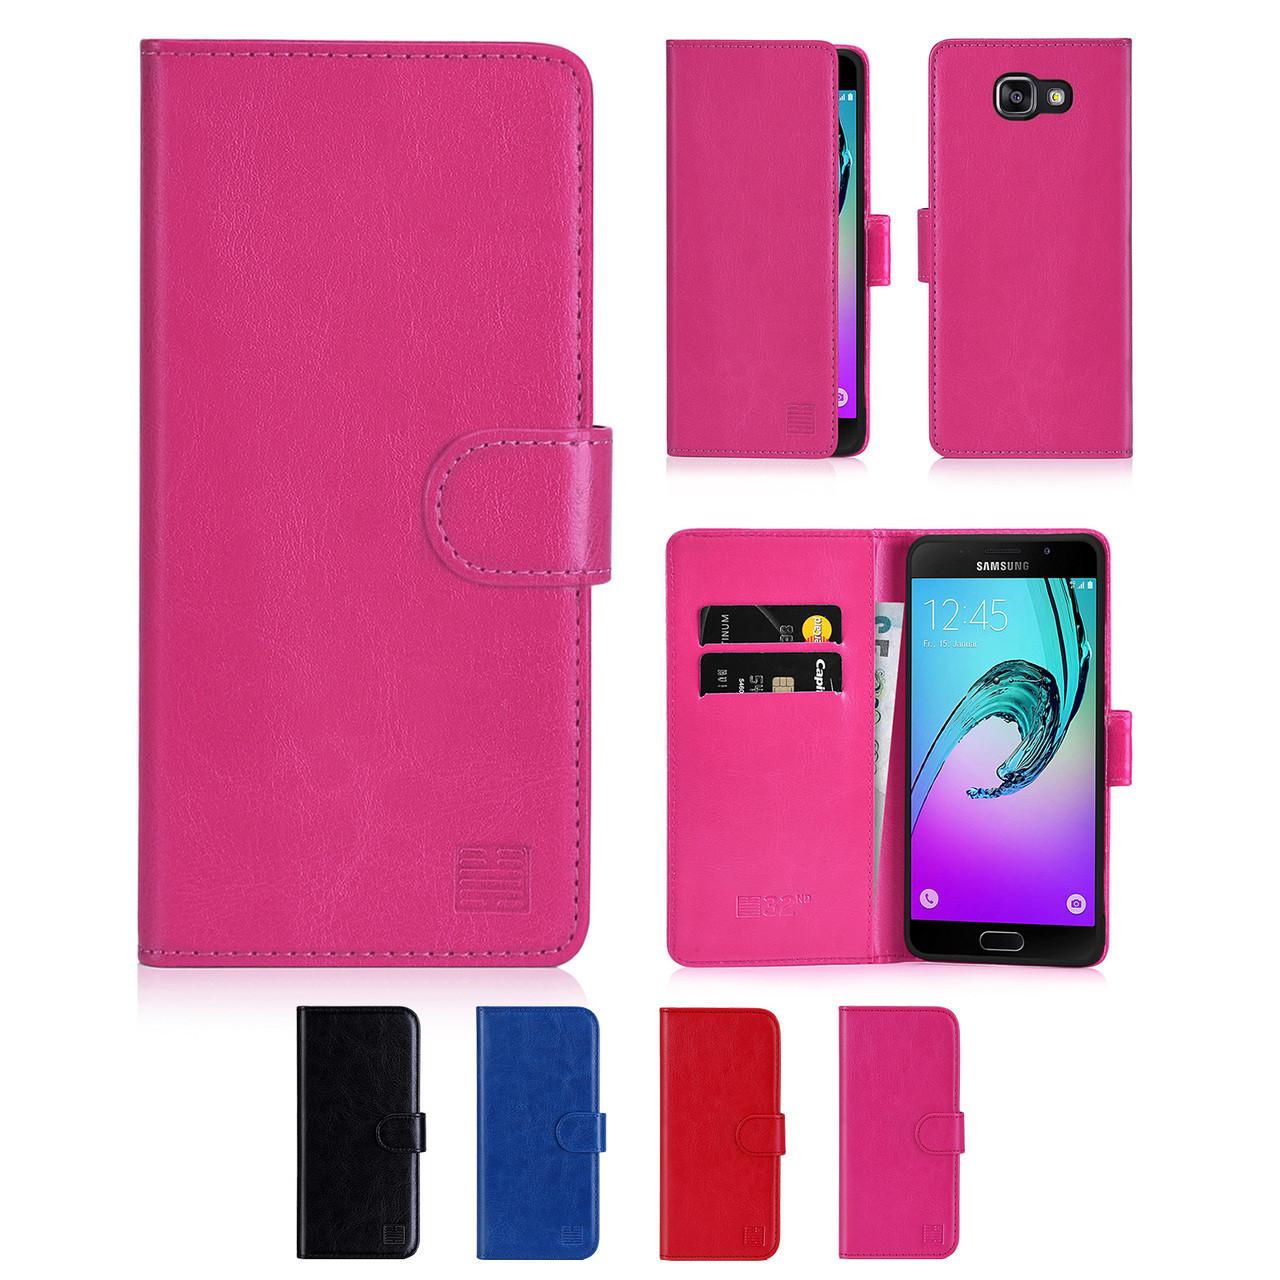 samsung galaxy a5 2016 phone case